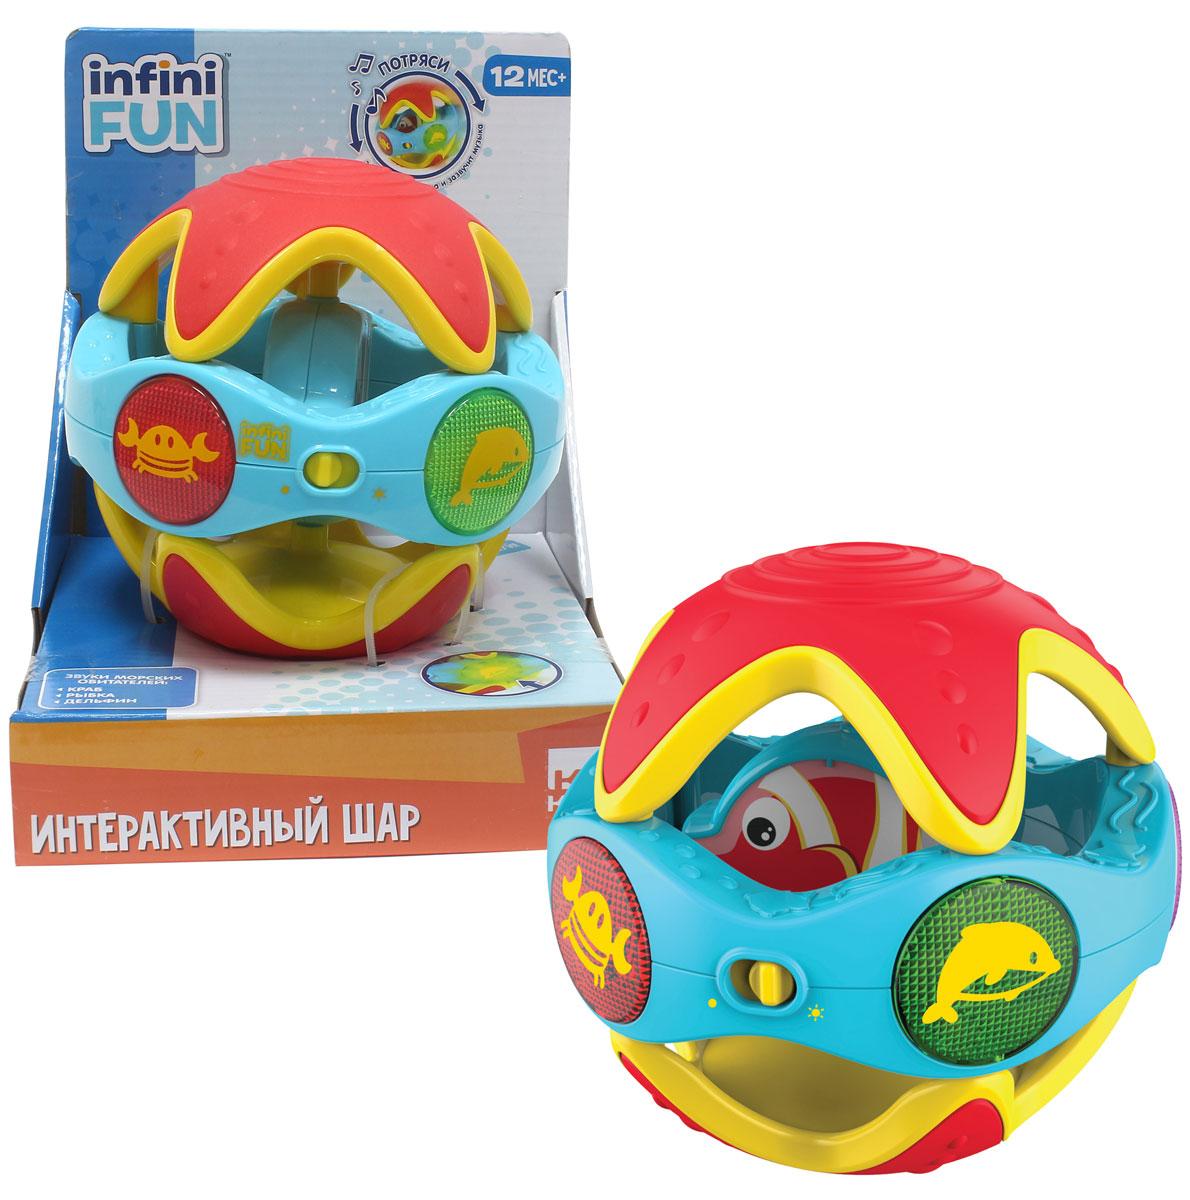 1TOY Развивающая игрушка Kidz Delight Интерактивный шар